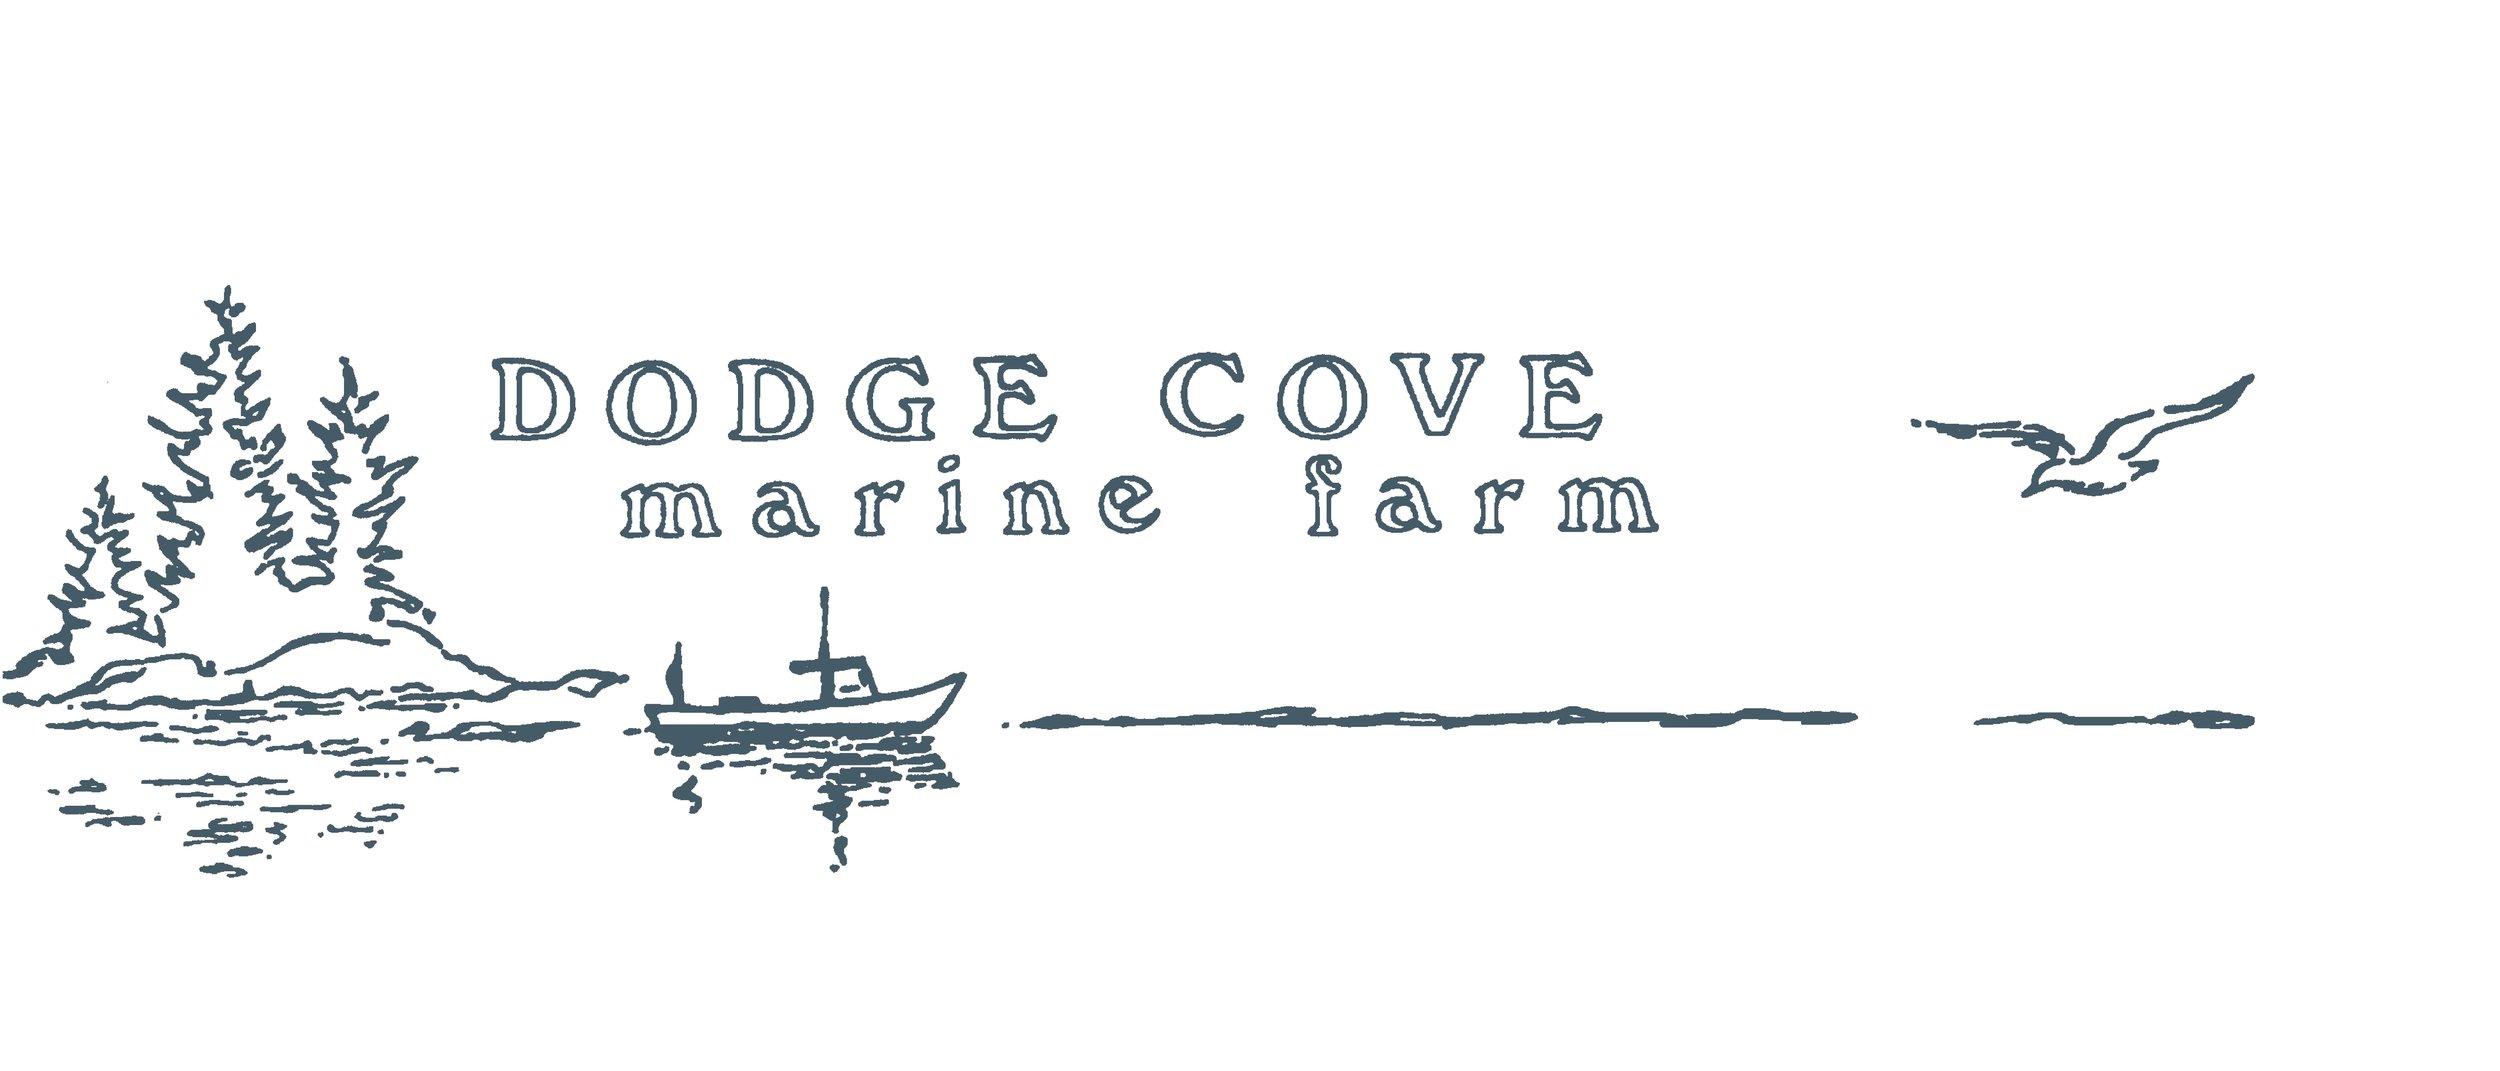 DodgeCove_logo.jpg